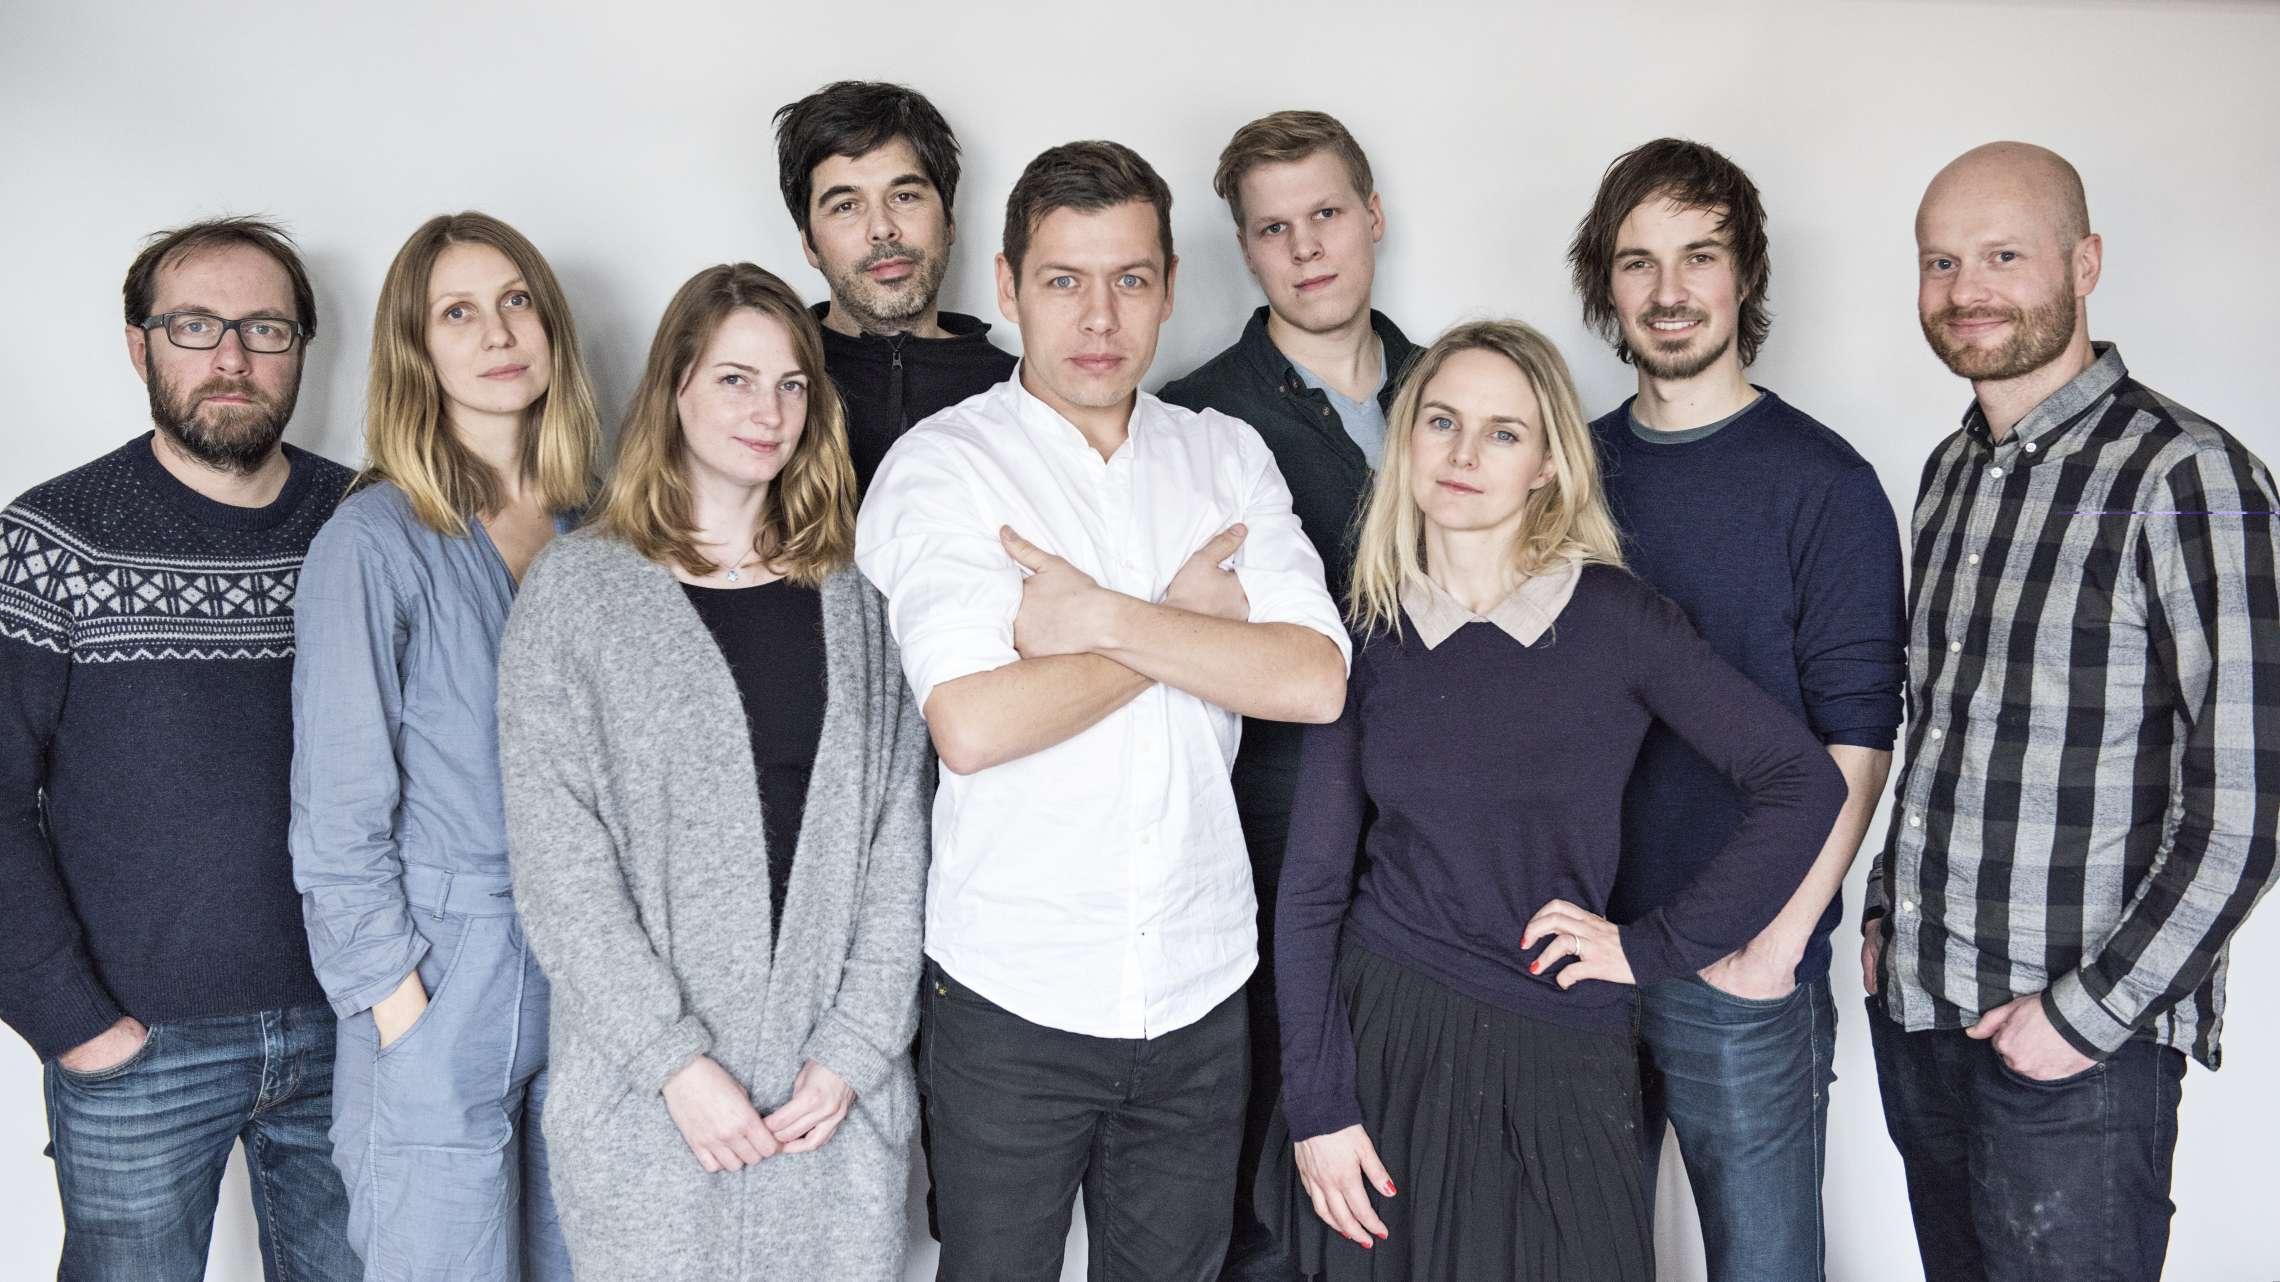 PK_juryering_åretsbilde_2017-3664